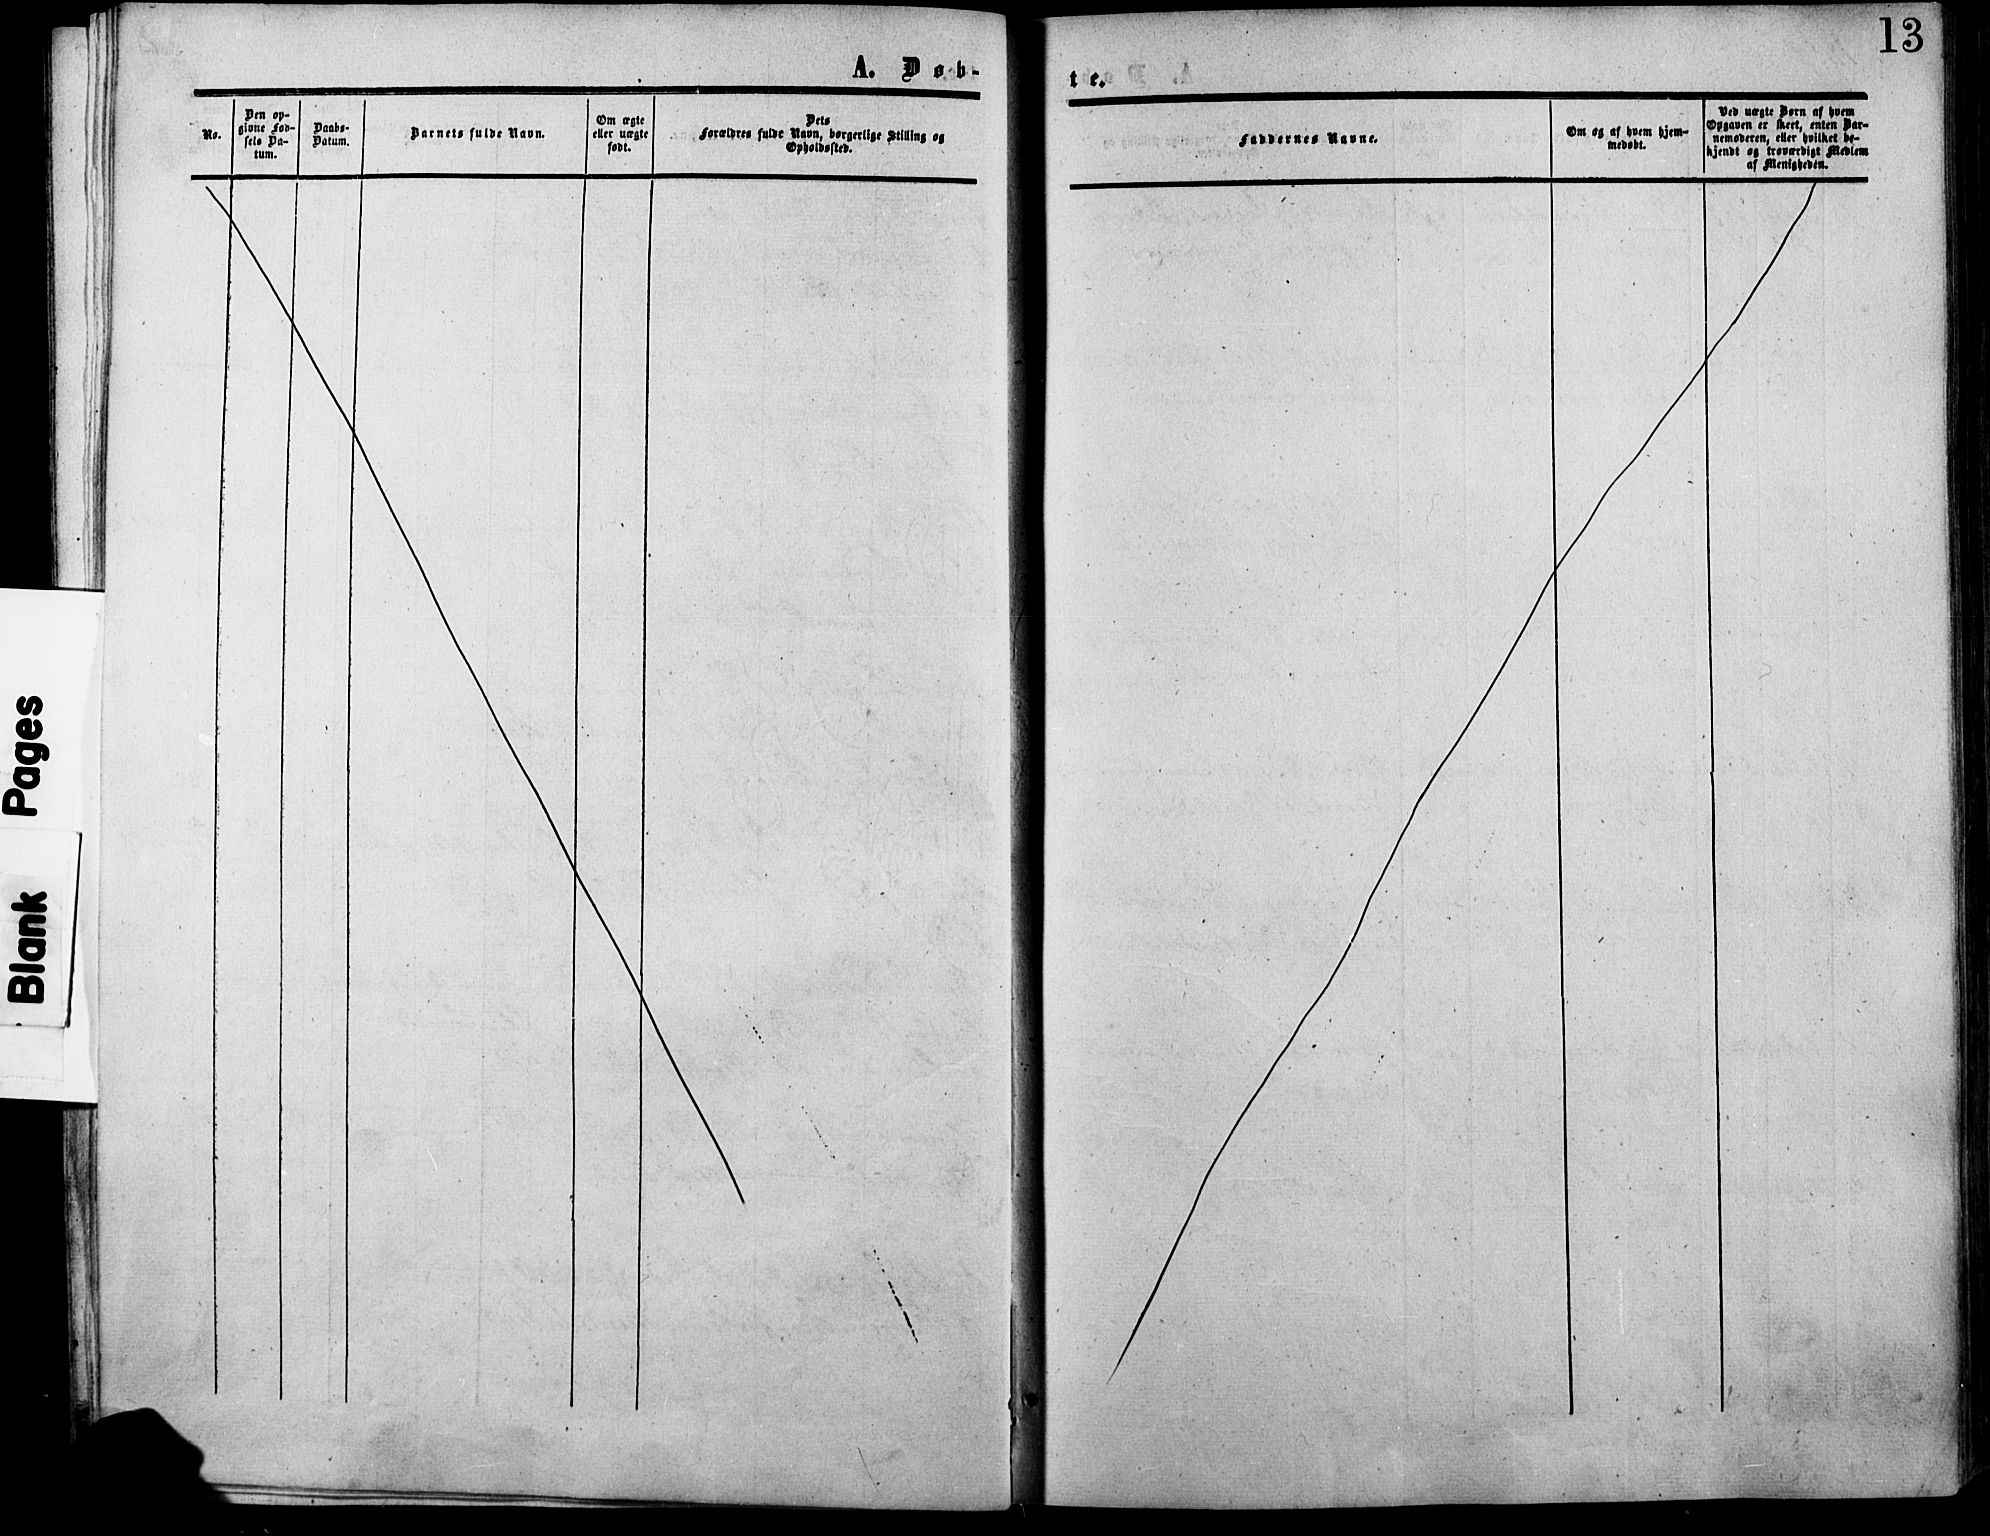 SAH, Lesja prestekontor, Ministerialbok nr. 7, 1854-1862, s. 13